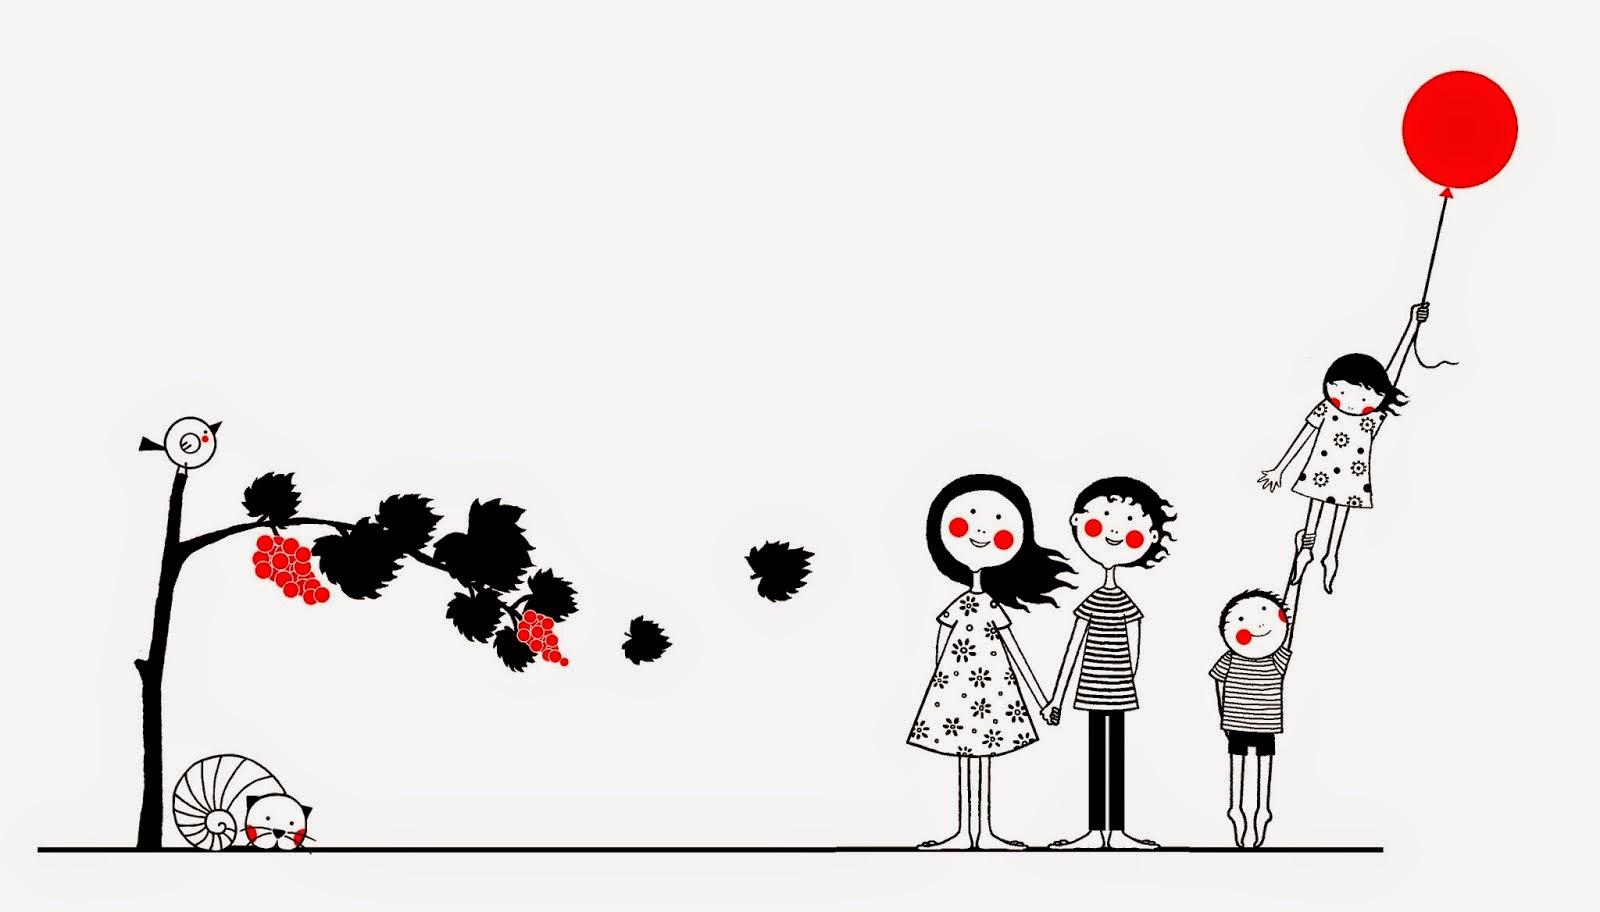 Familia ilustrada por Coloretes